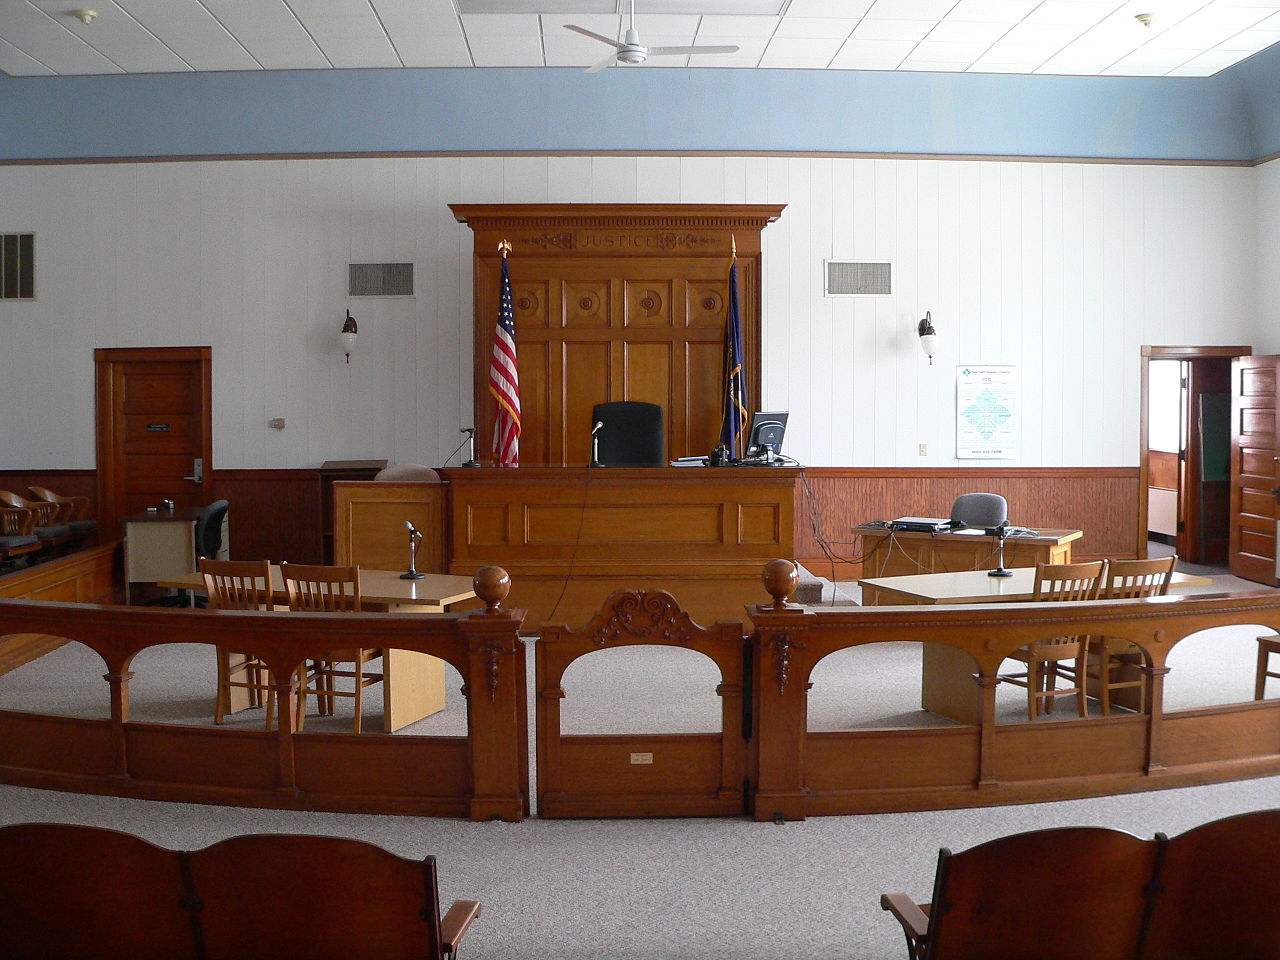 1280px-Wayne_County_Courthouse_(Nebraska)_courtroom_1